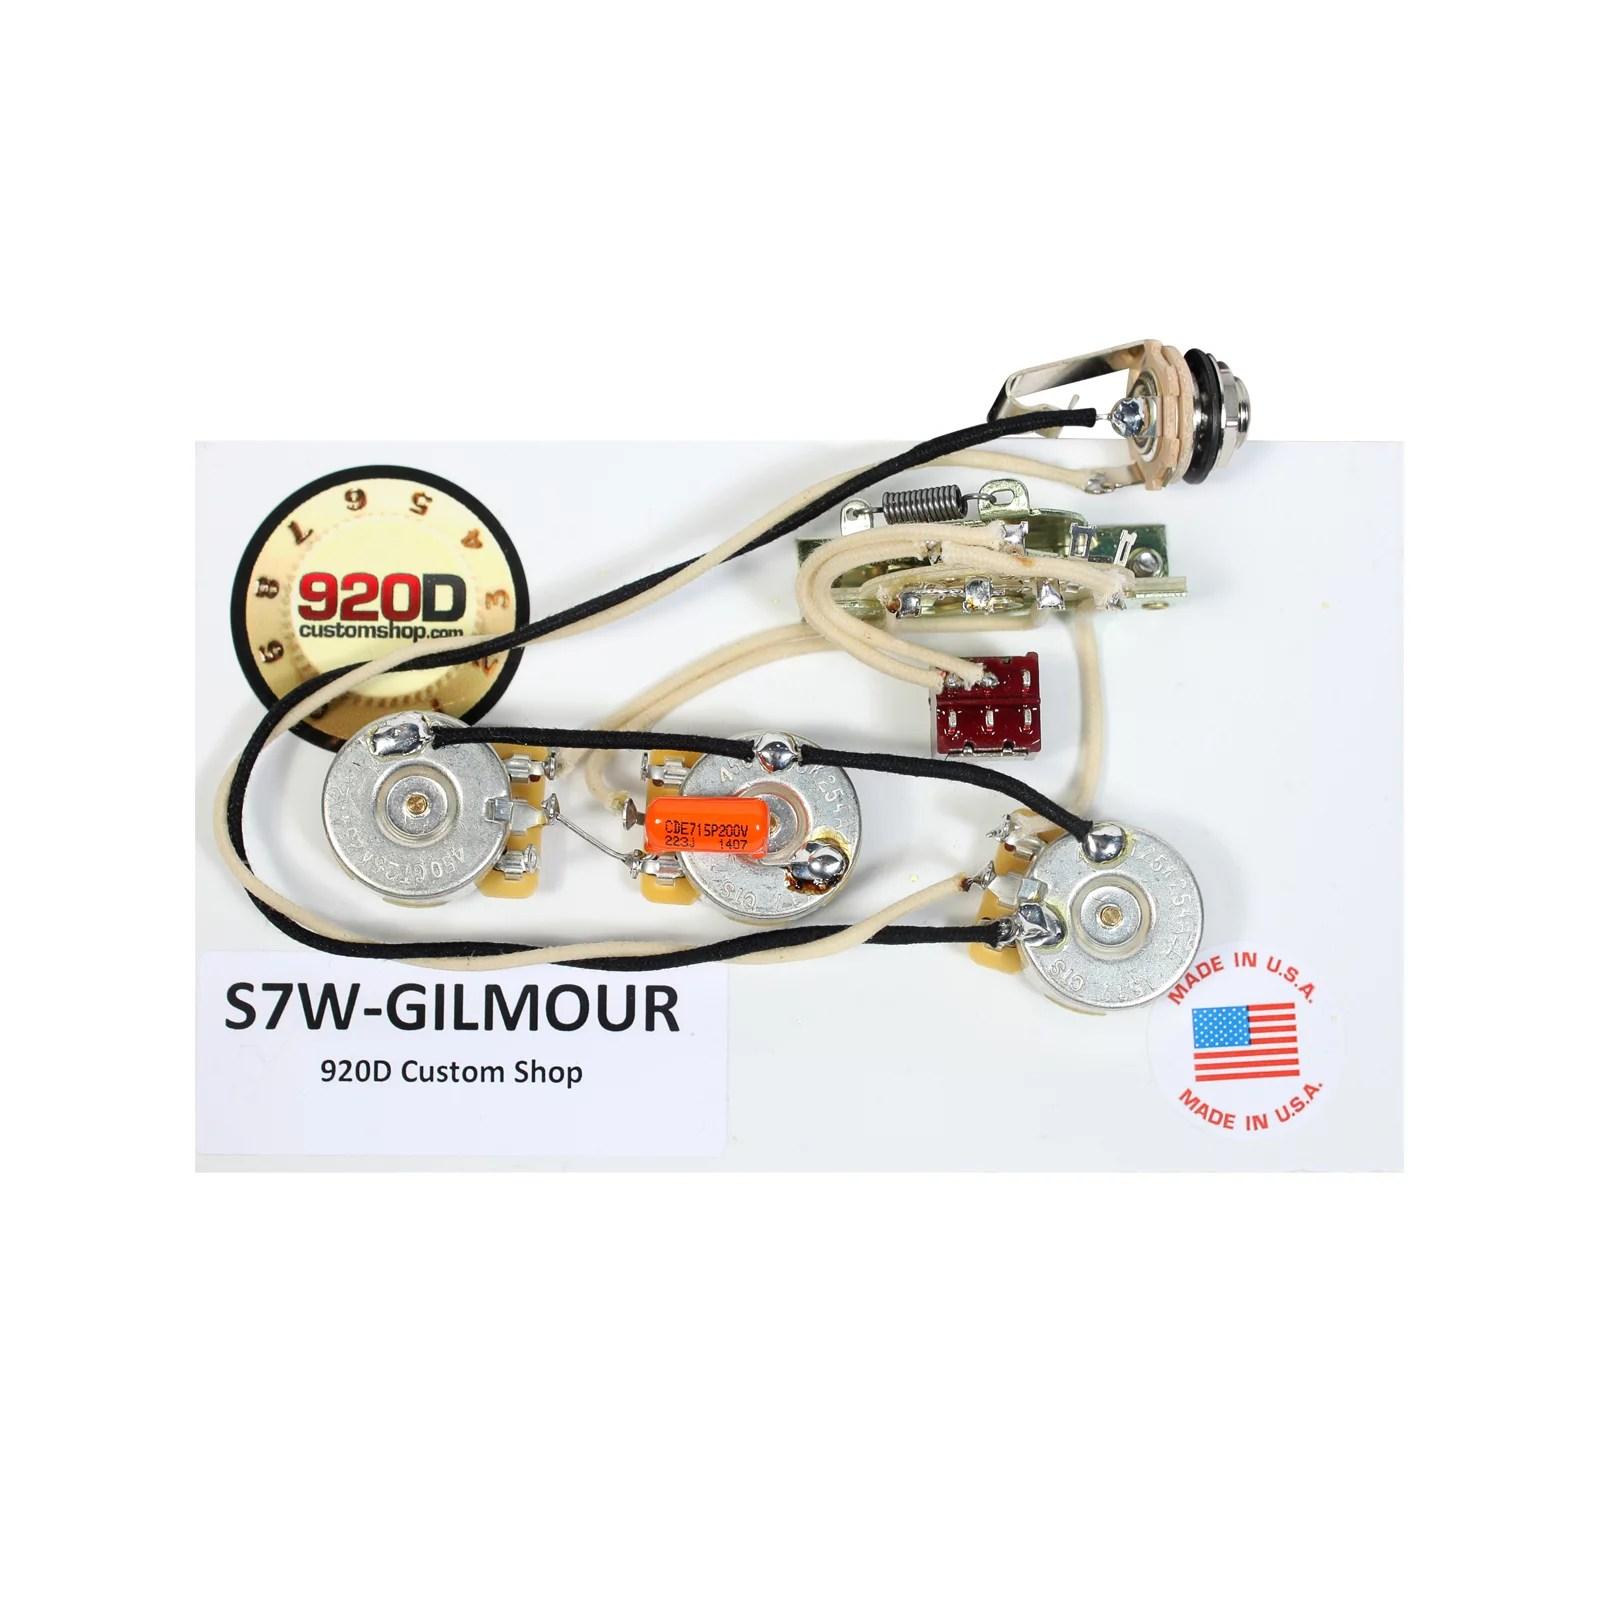 fender strat stratocaster david gilmour 7 way wiring harness mini fender strat stratocaster david gilmour 7 [ 1600 x 1600 Pixel ]